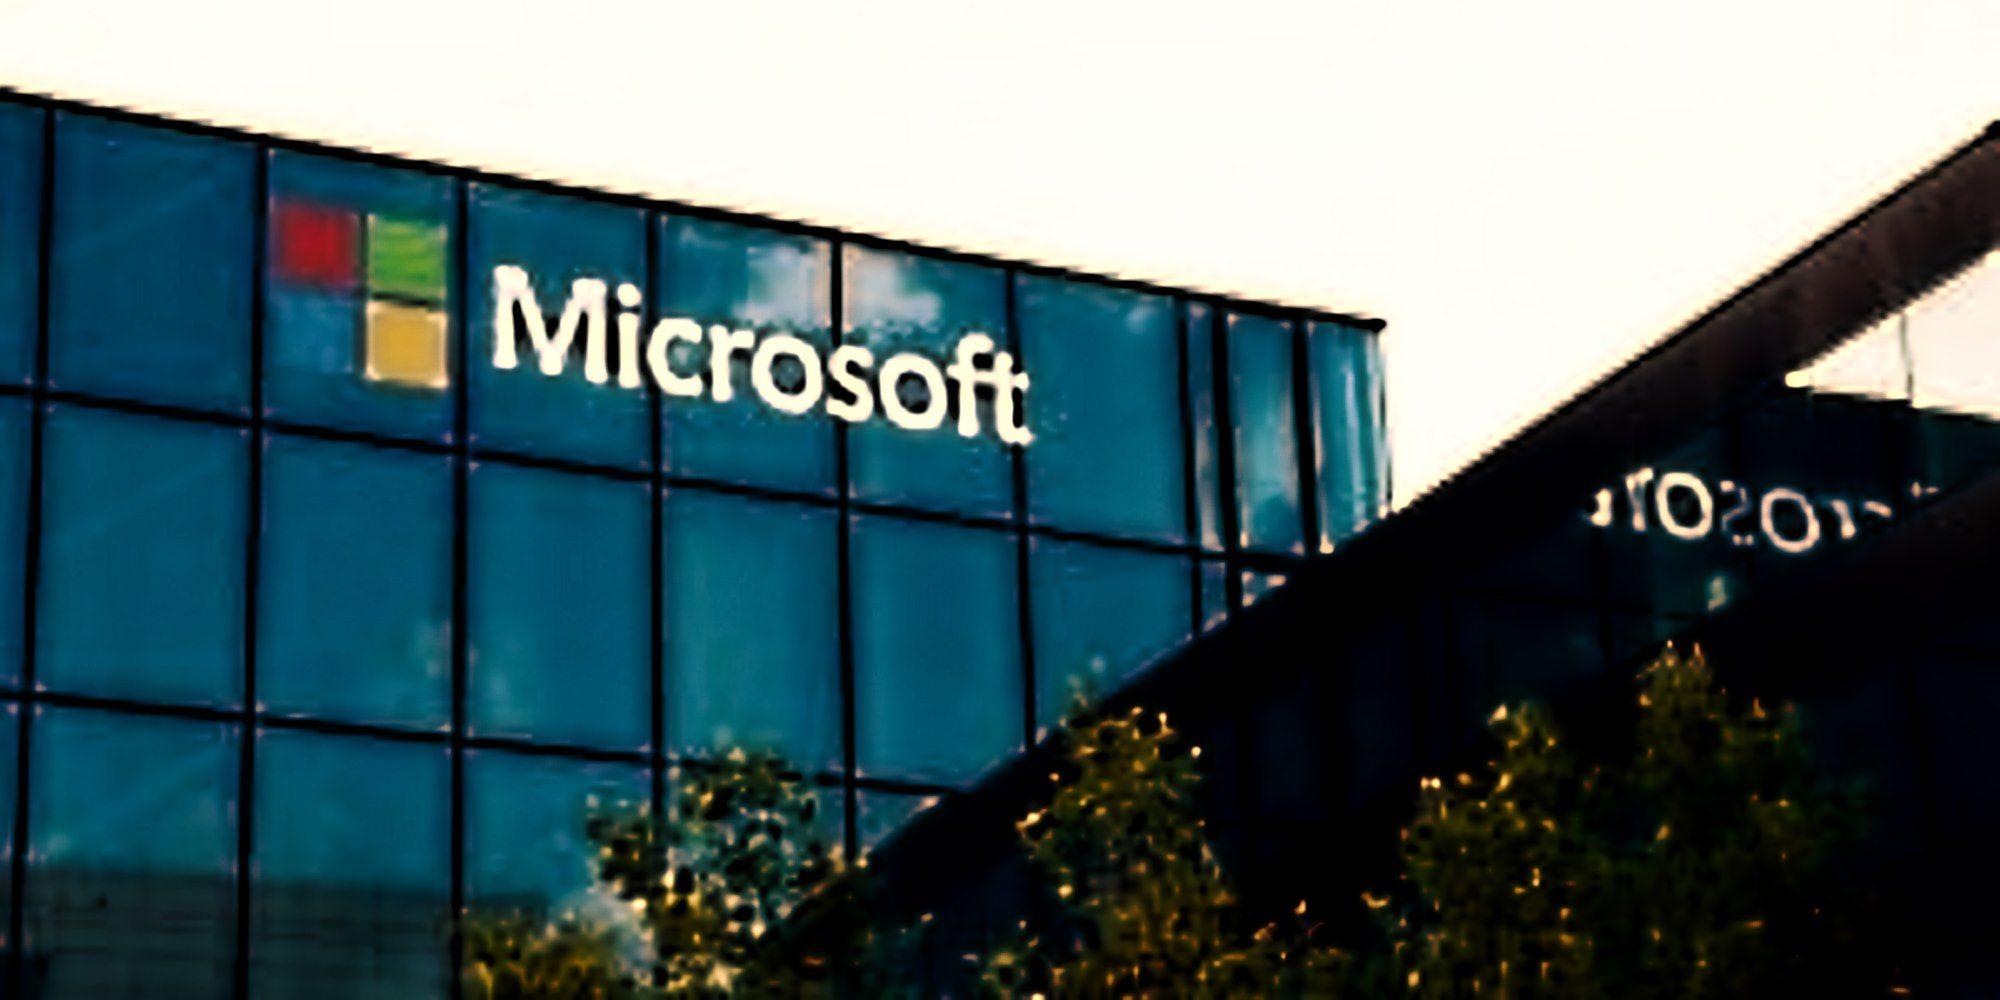 Mcirosoft to become next IBM?